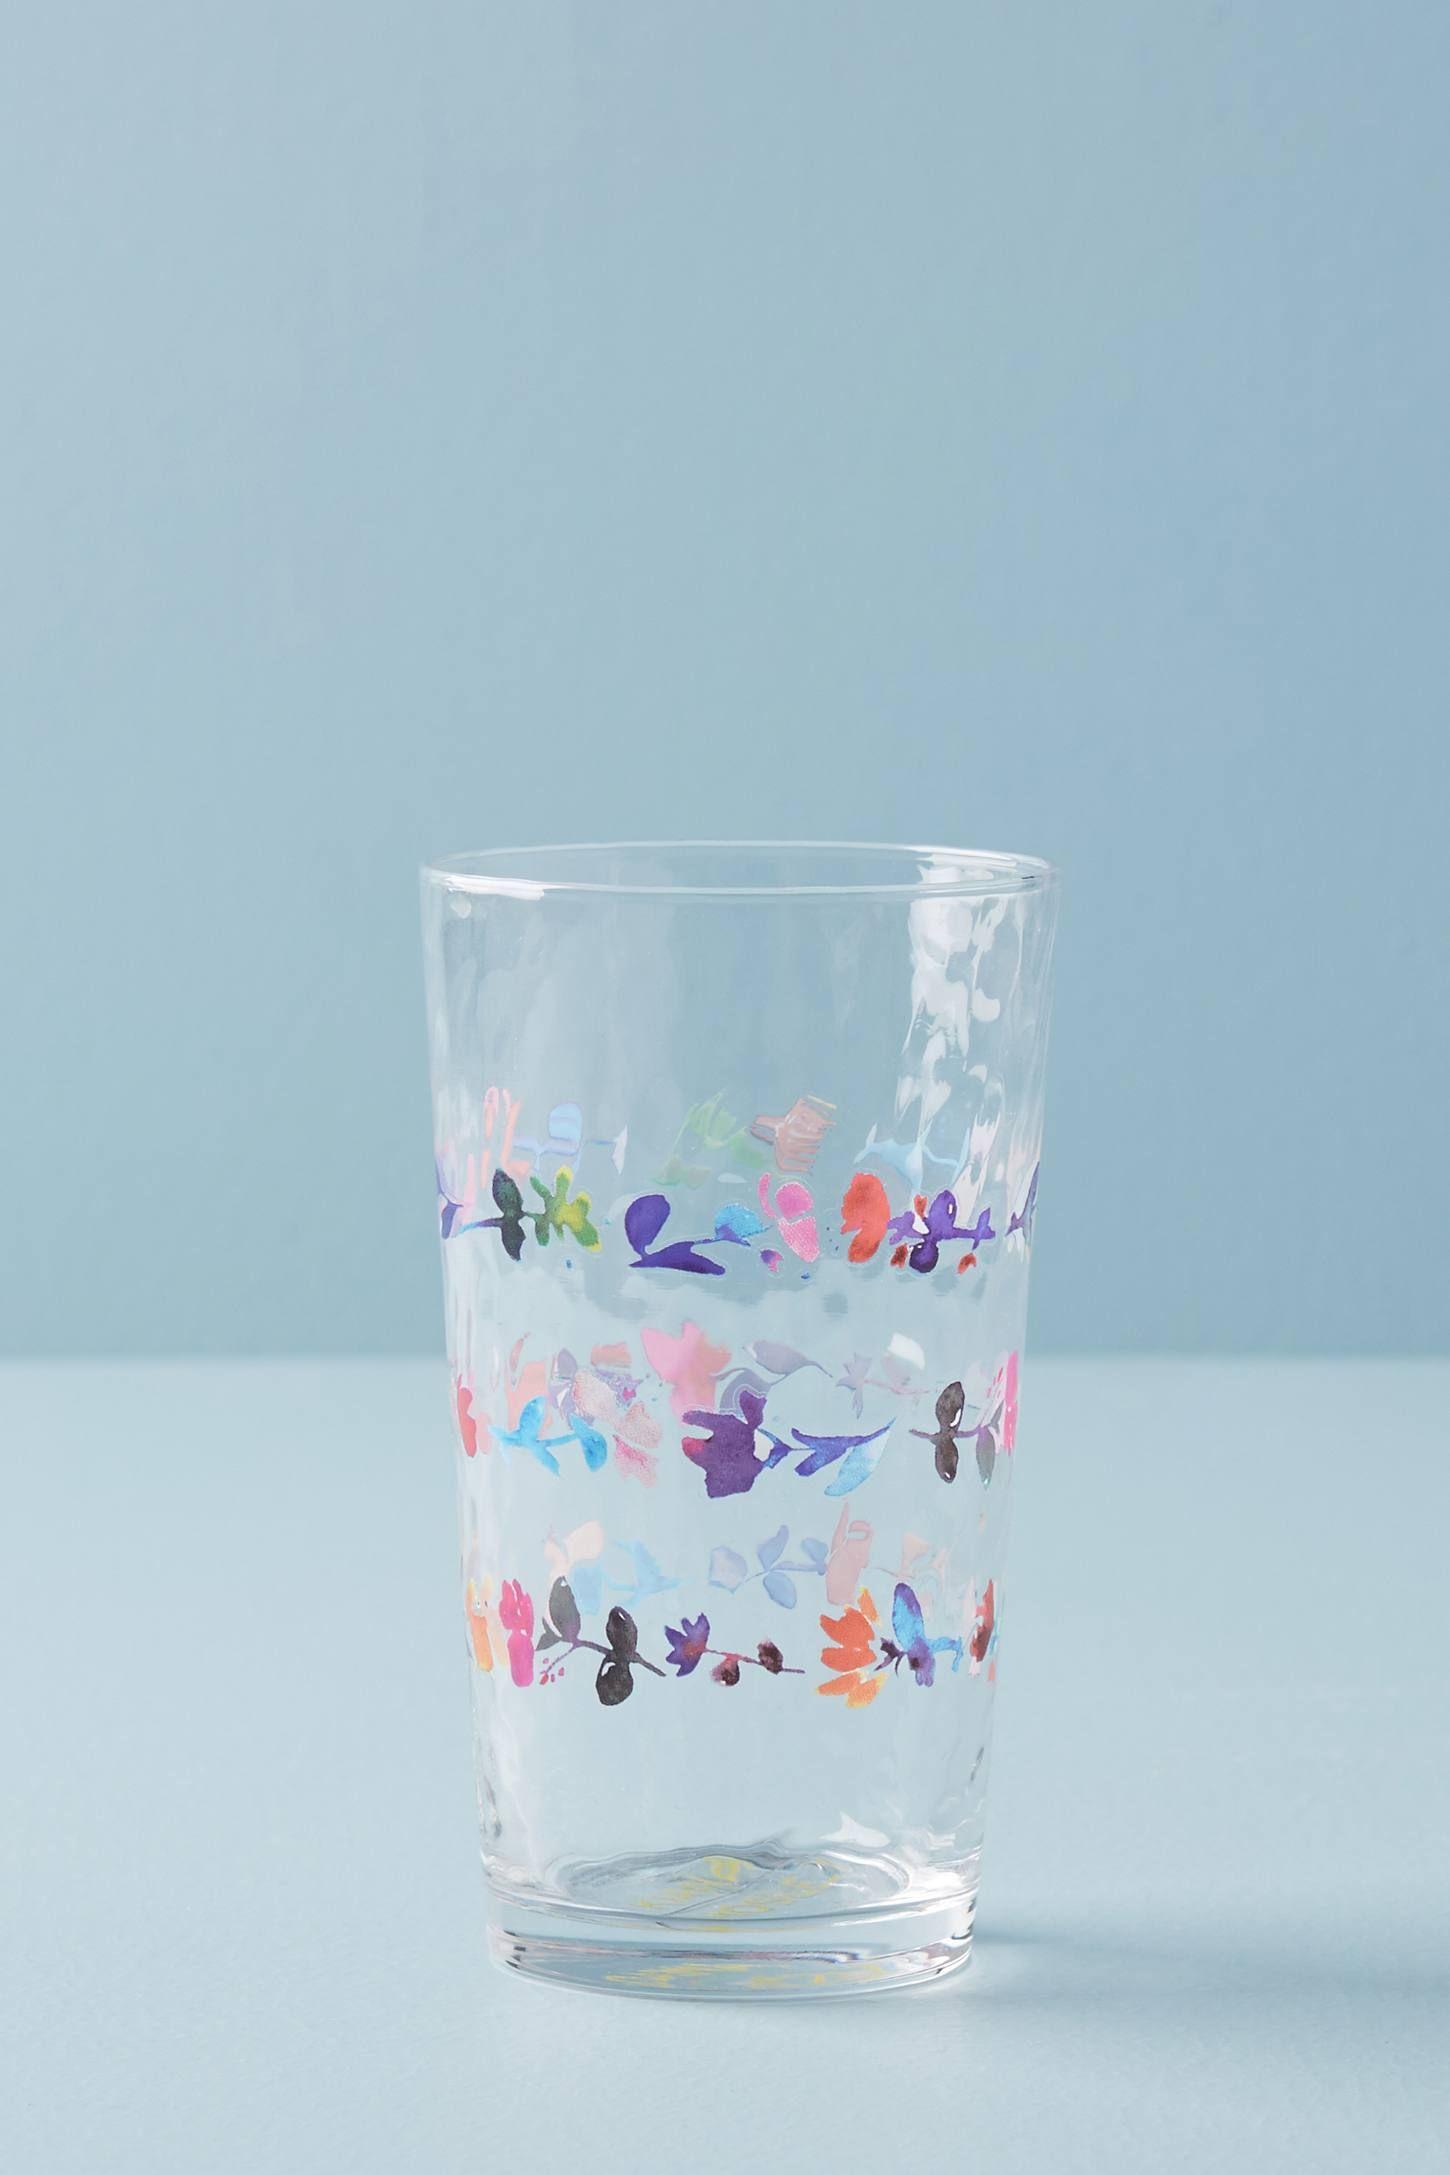 Jubilation Juice Glass | Juice, Glass and Kitchen utensils